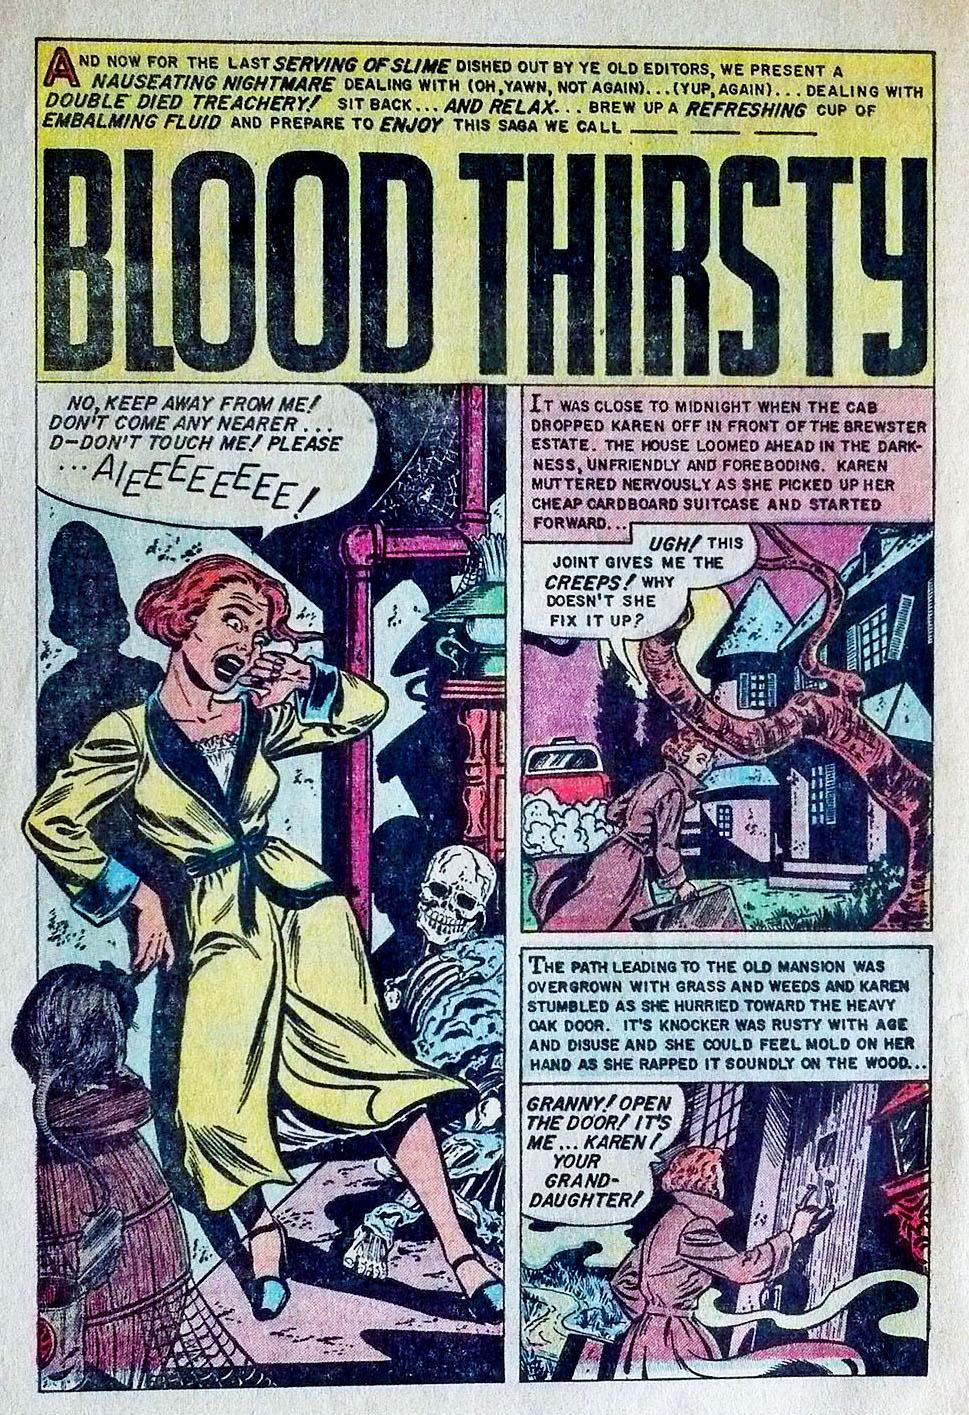 BloodThirsty1